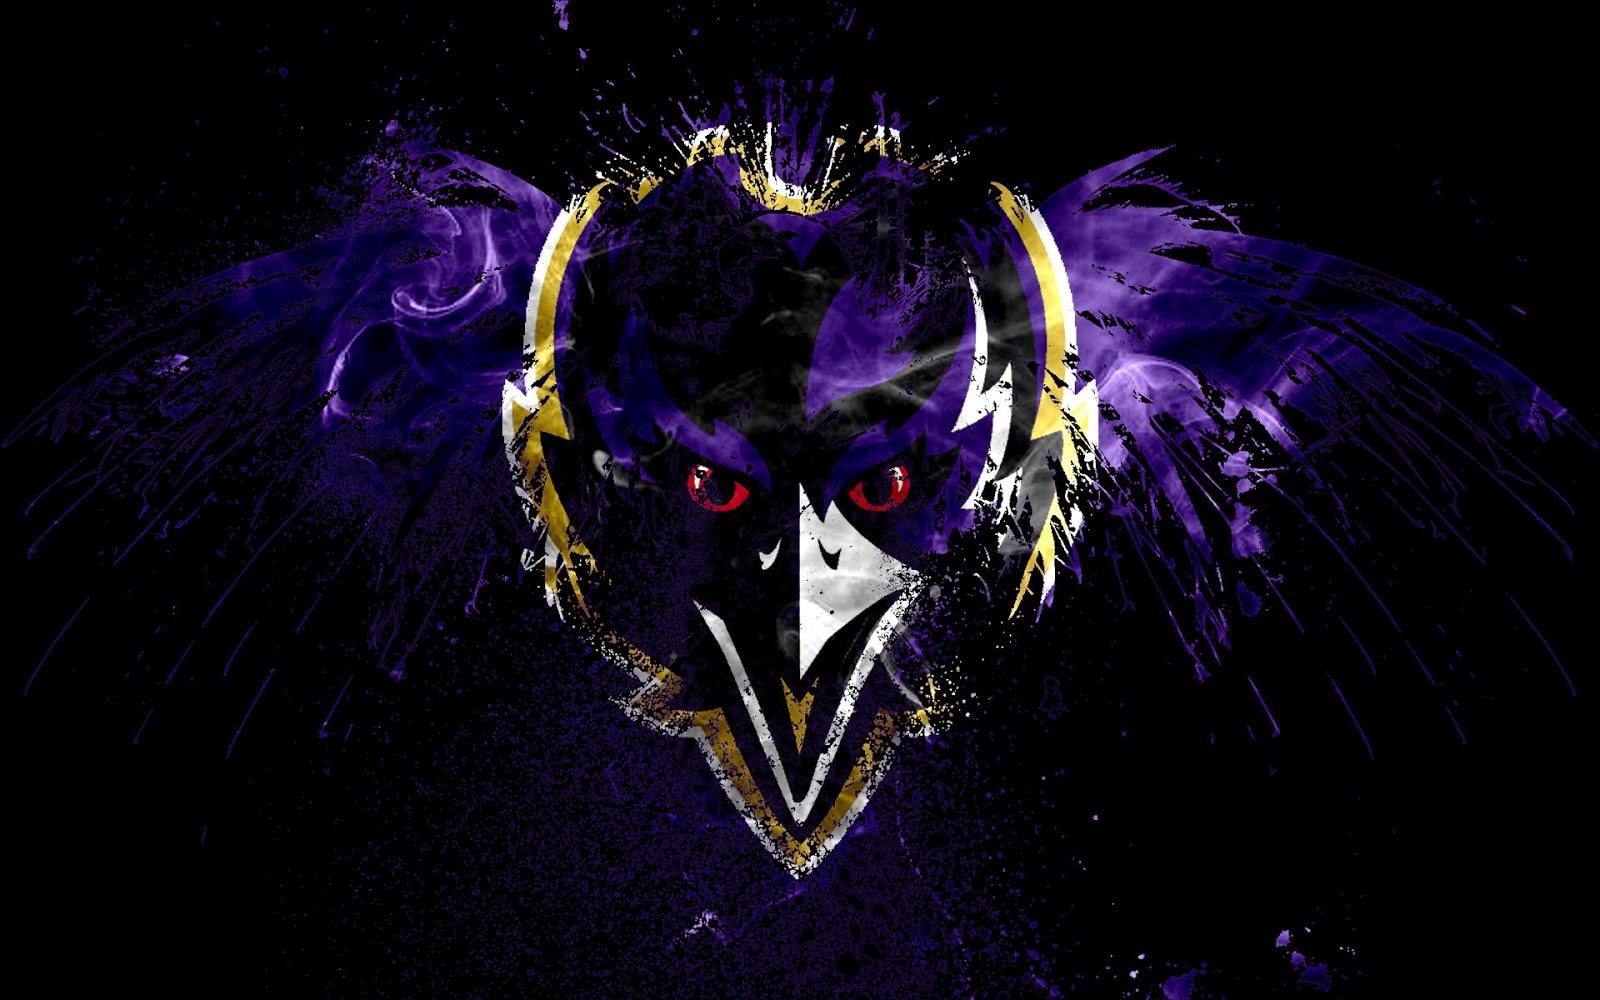 Leelee Sobieski HD Wallpapers Photos: Ravens Wallpapers HD